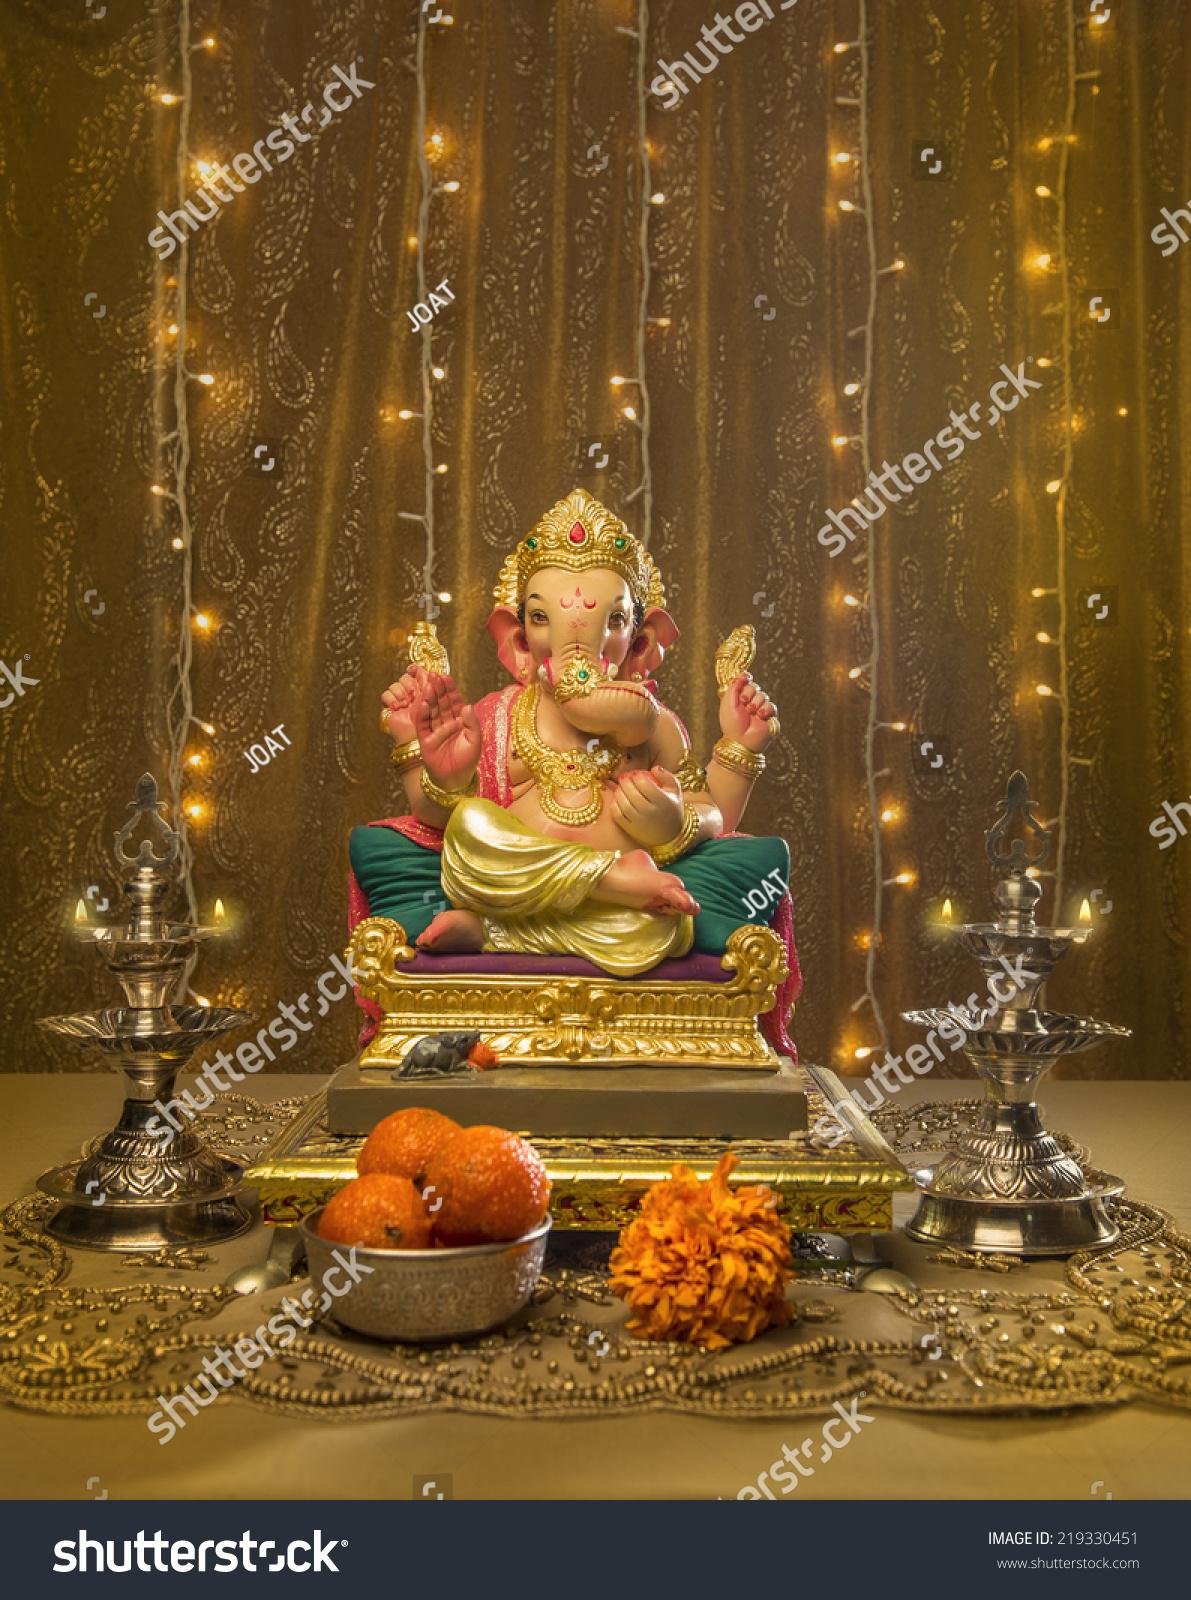 Ganesha idol elaborate indian pooja set stock photo for Background decoration for ganesh festival